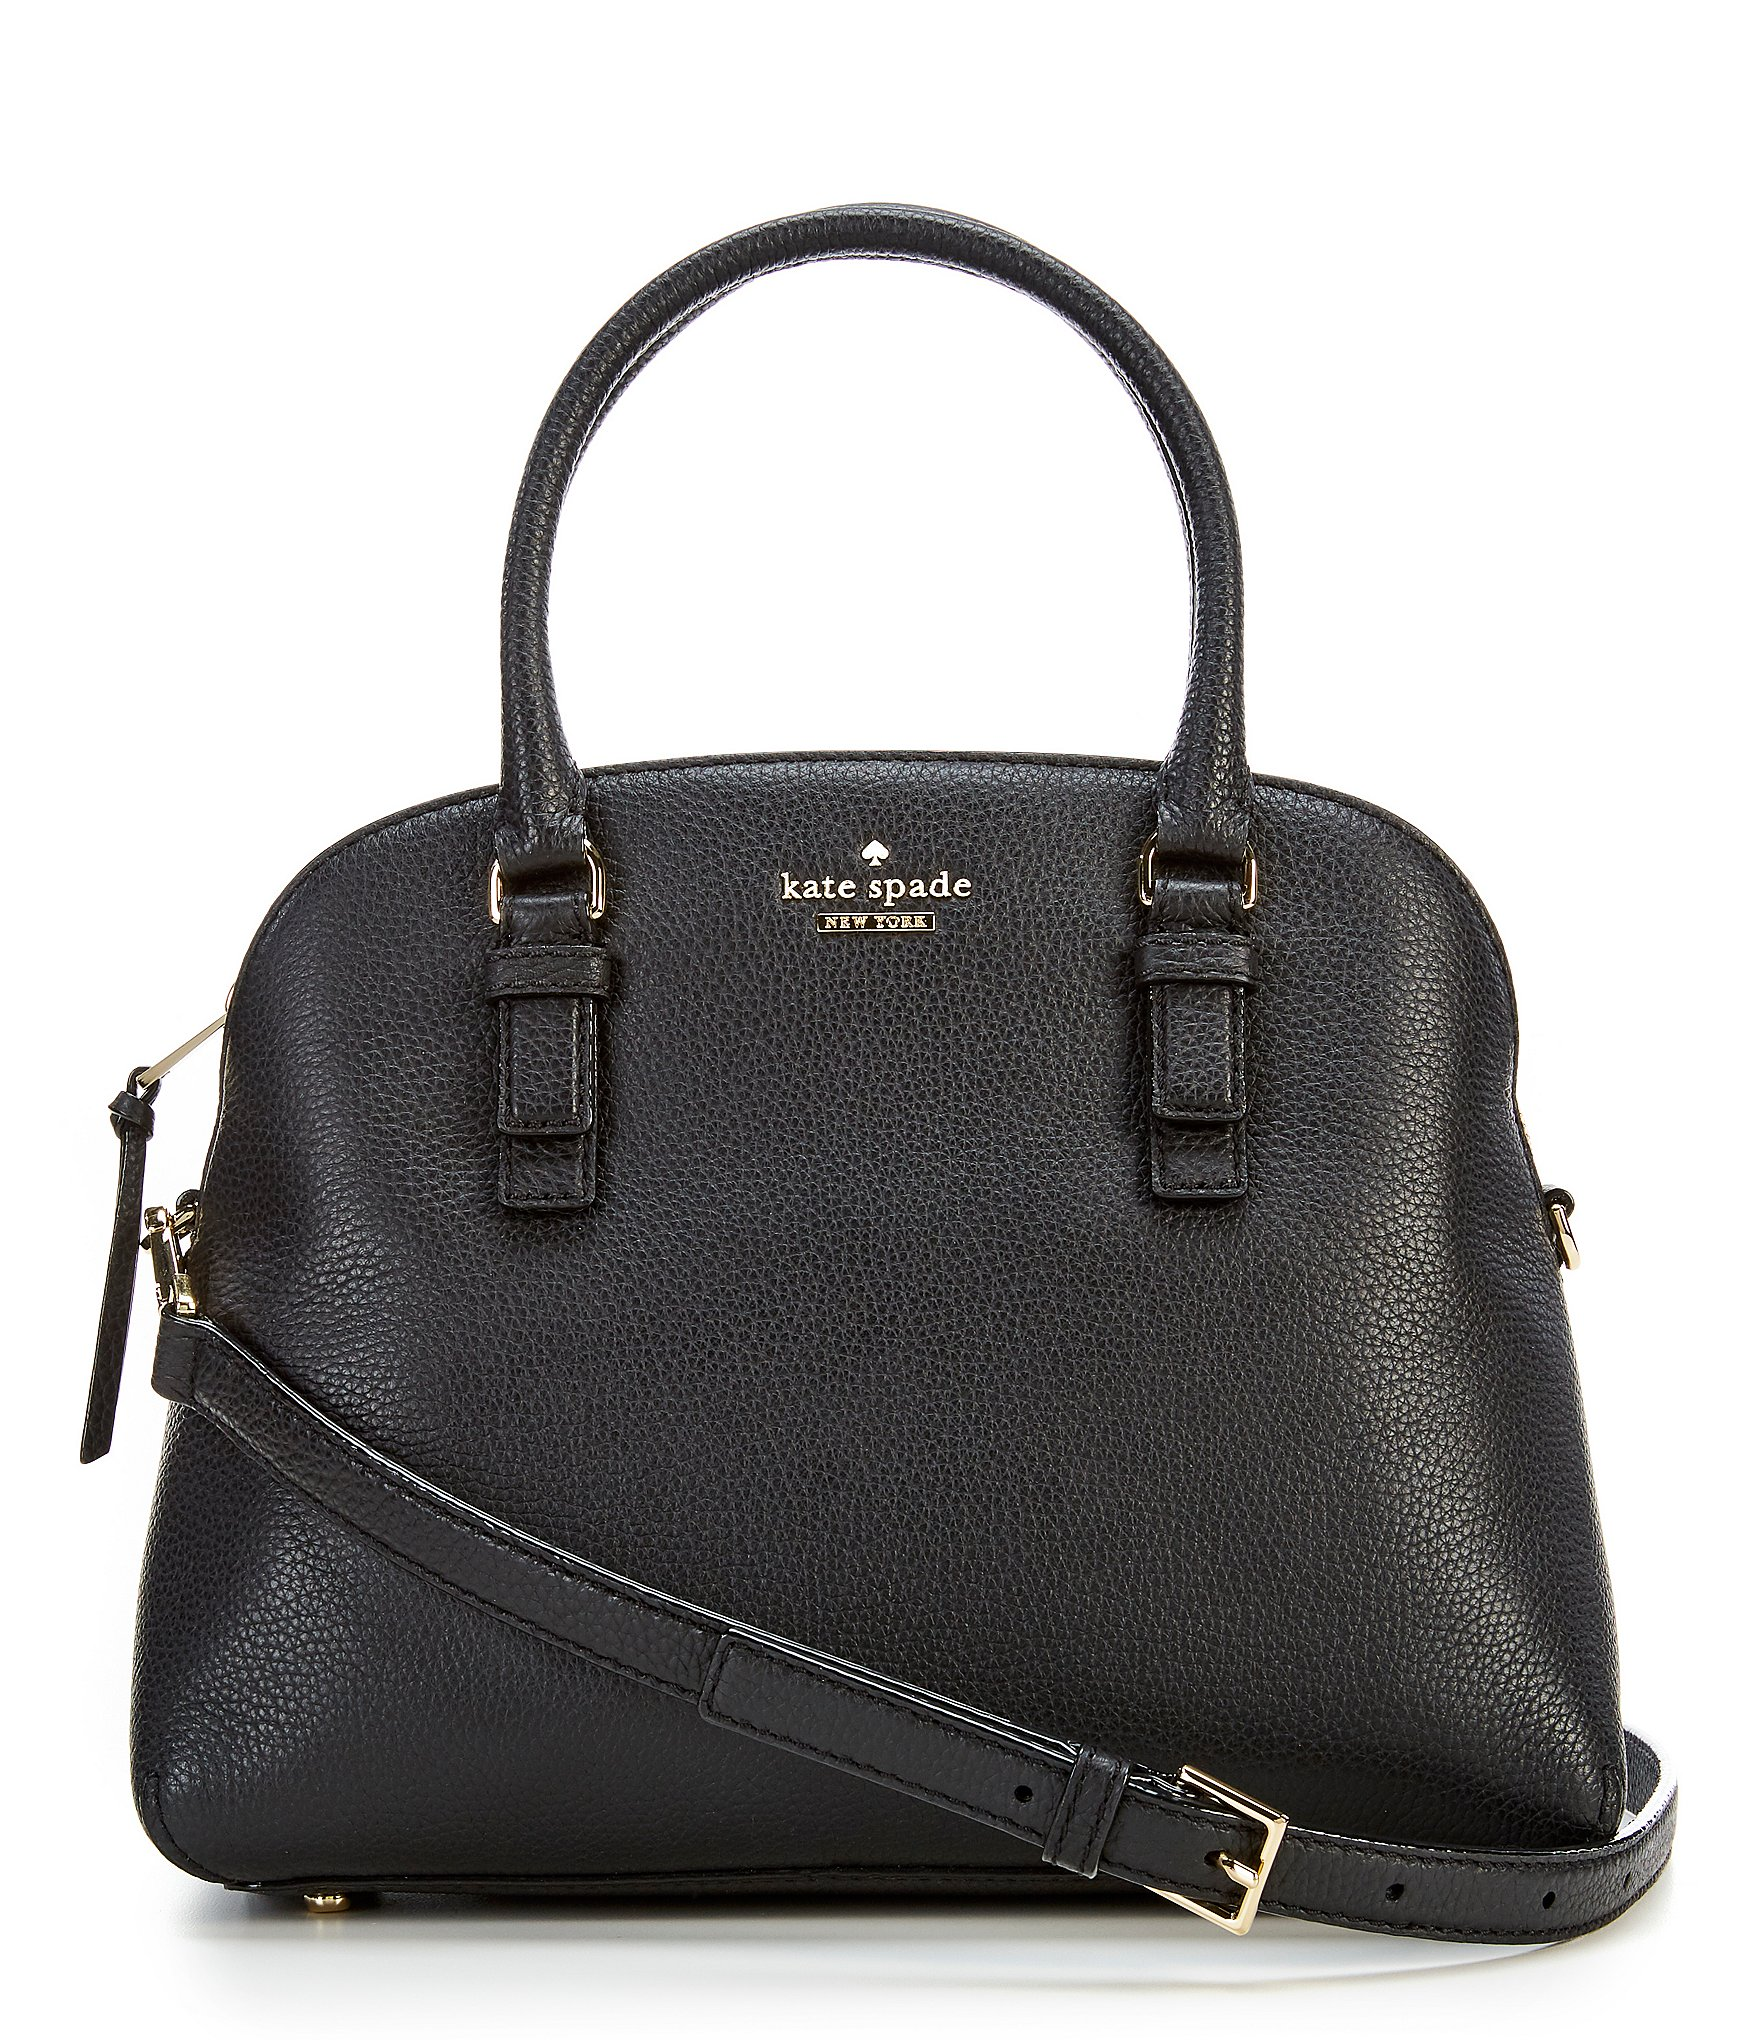 Kate spade new york handbags purses wallets dillards junglespirit Gallery